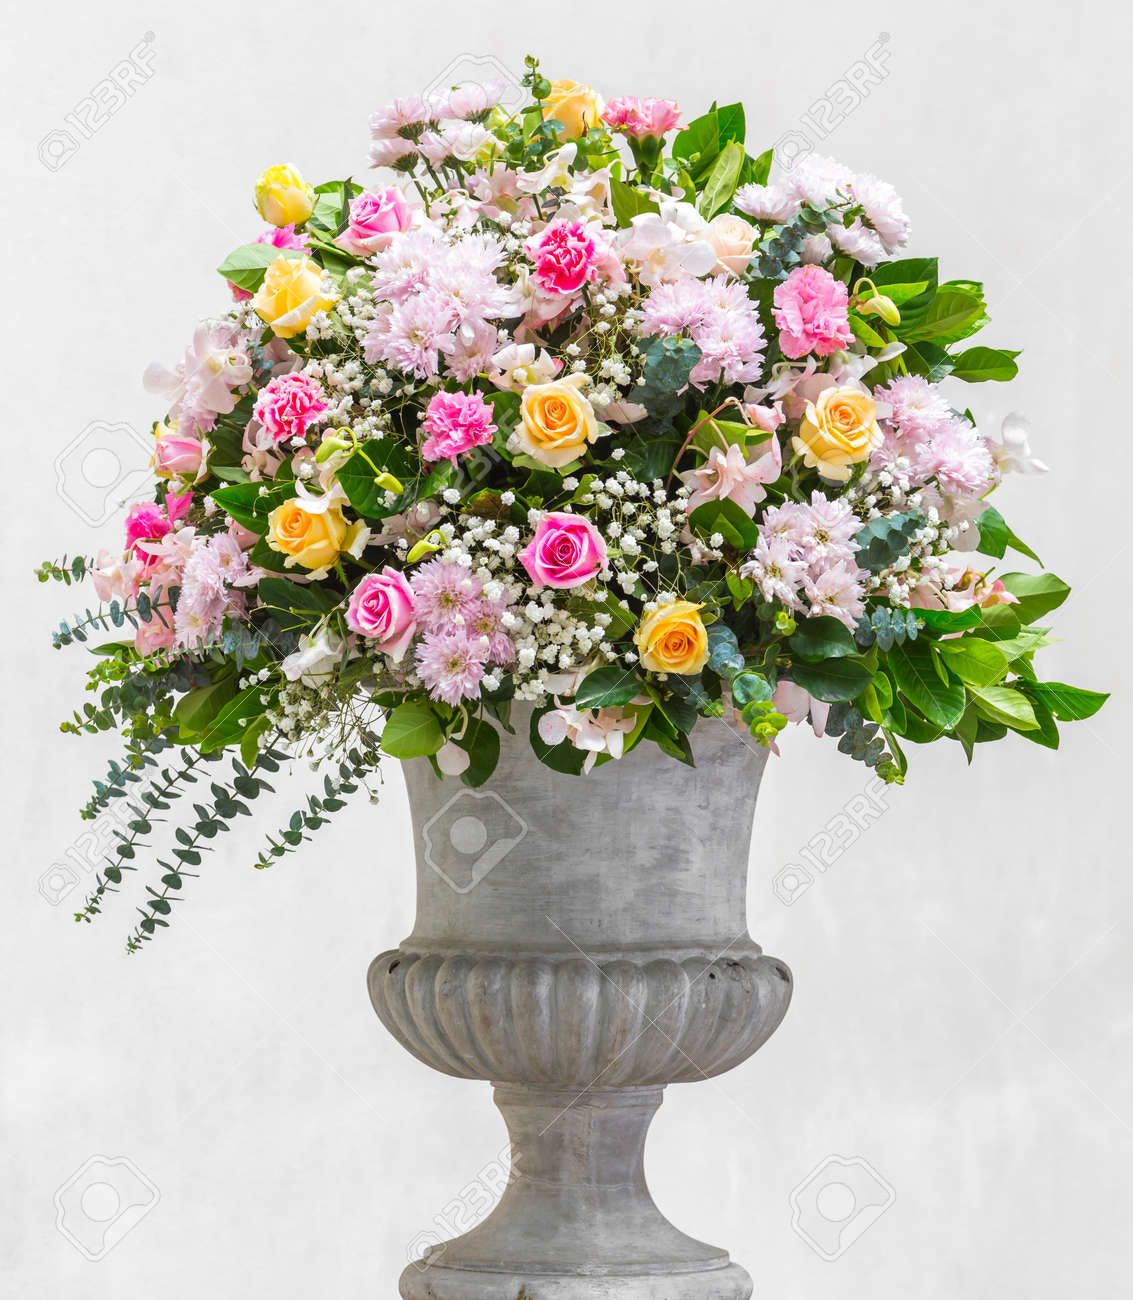 Flower Bouquet Decoration In Grunge Concrete Vase Stock Photo ...